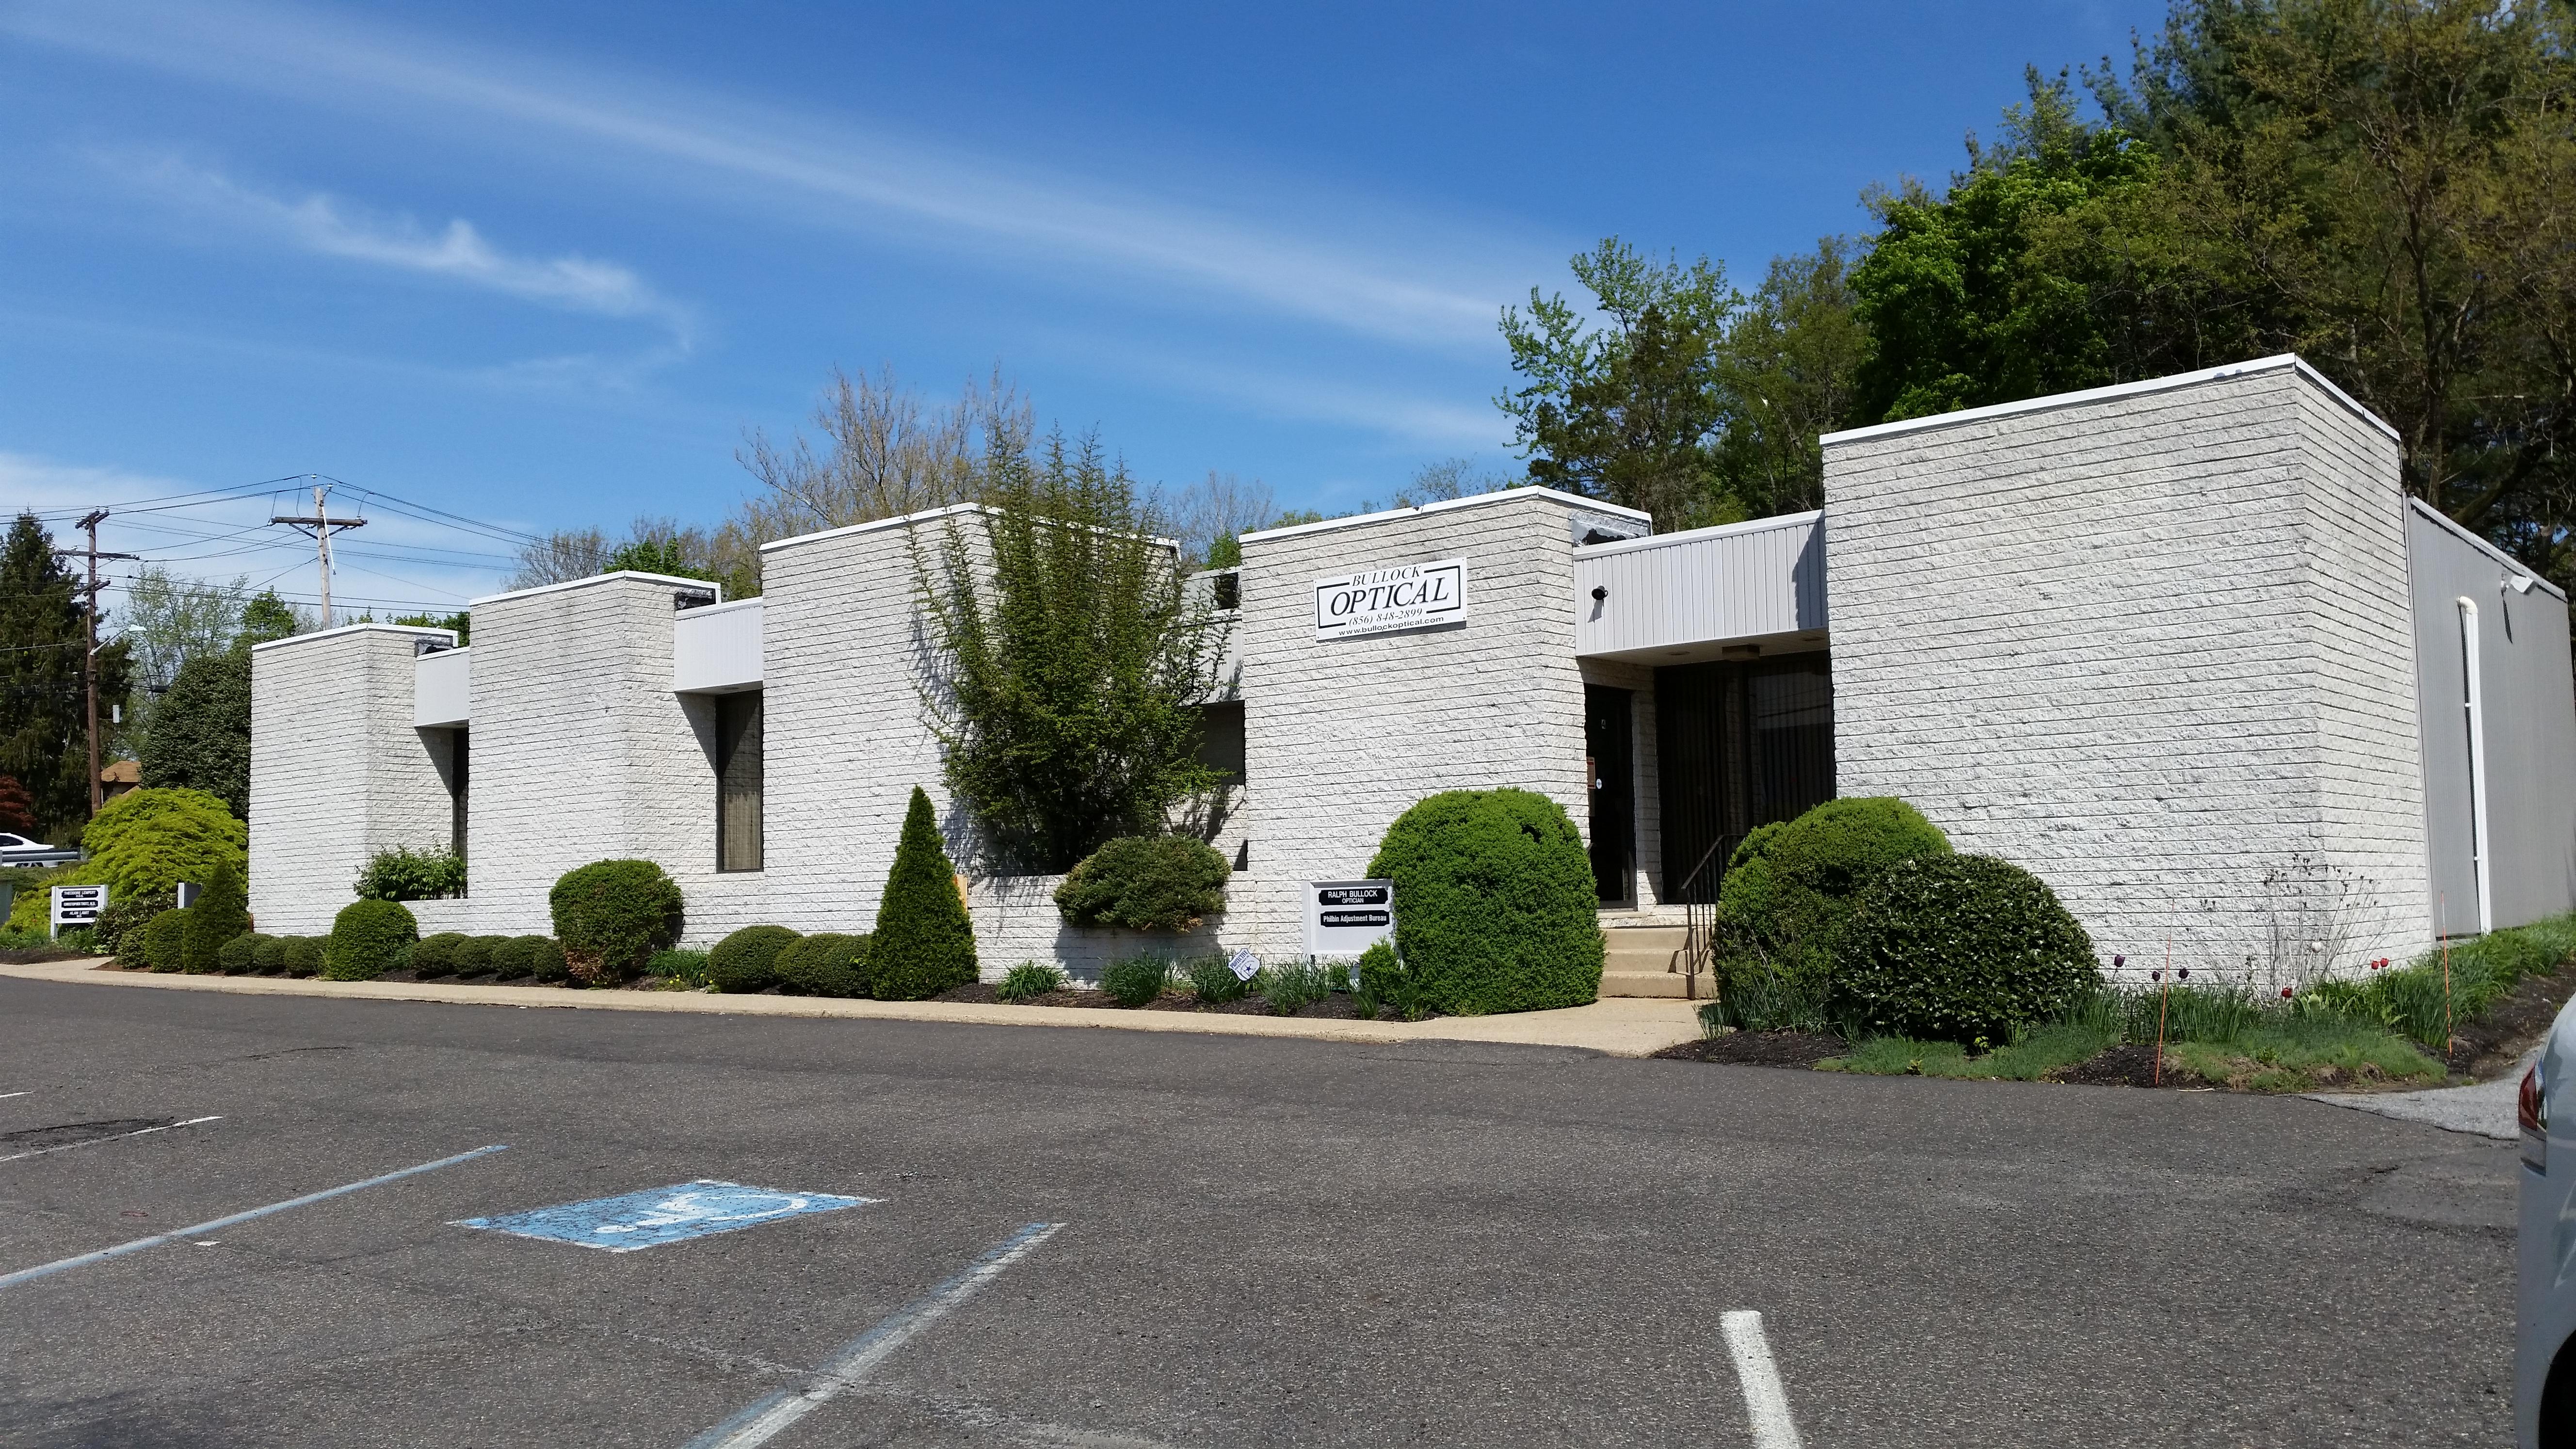 Sale of 7,350 SF Medical Office Building in Woodbury Heights, NJ